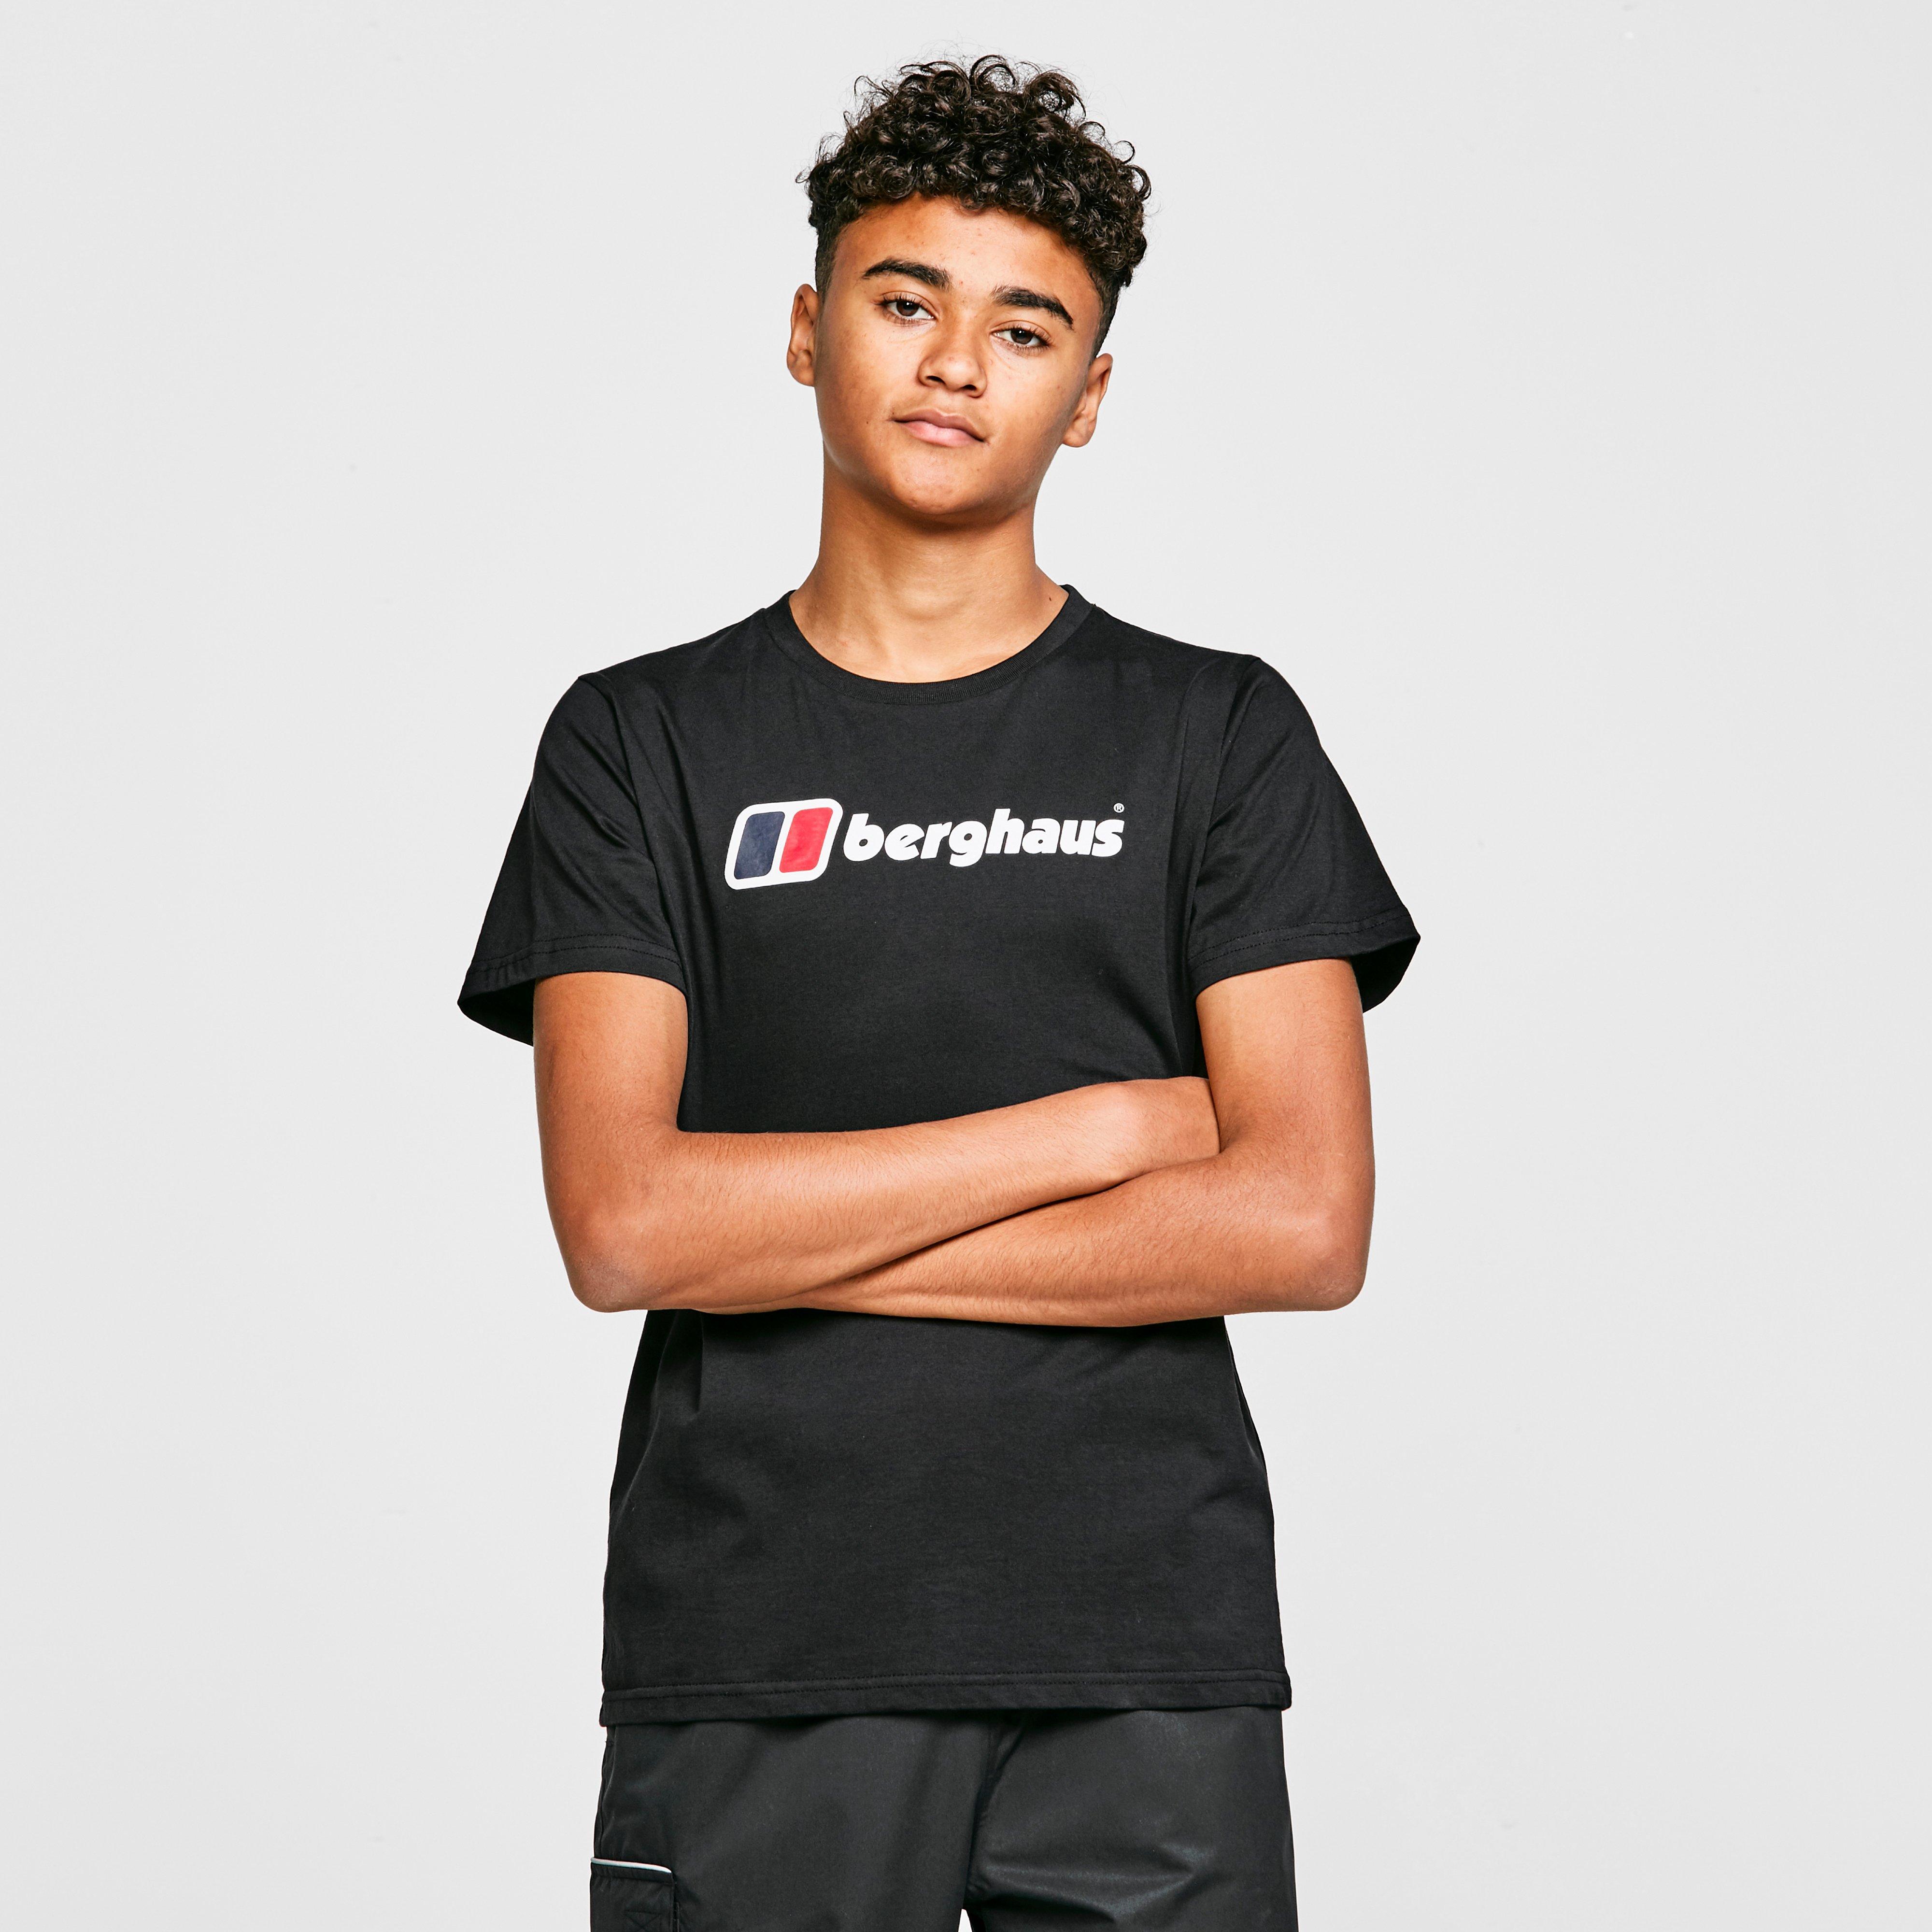 Berghaus Kids Logo T-shirt - Black/blk  Black/blk